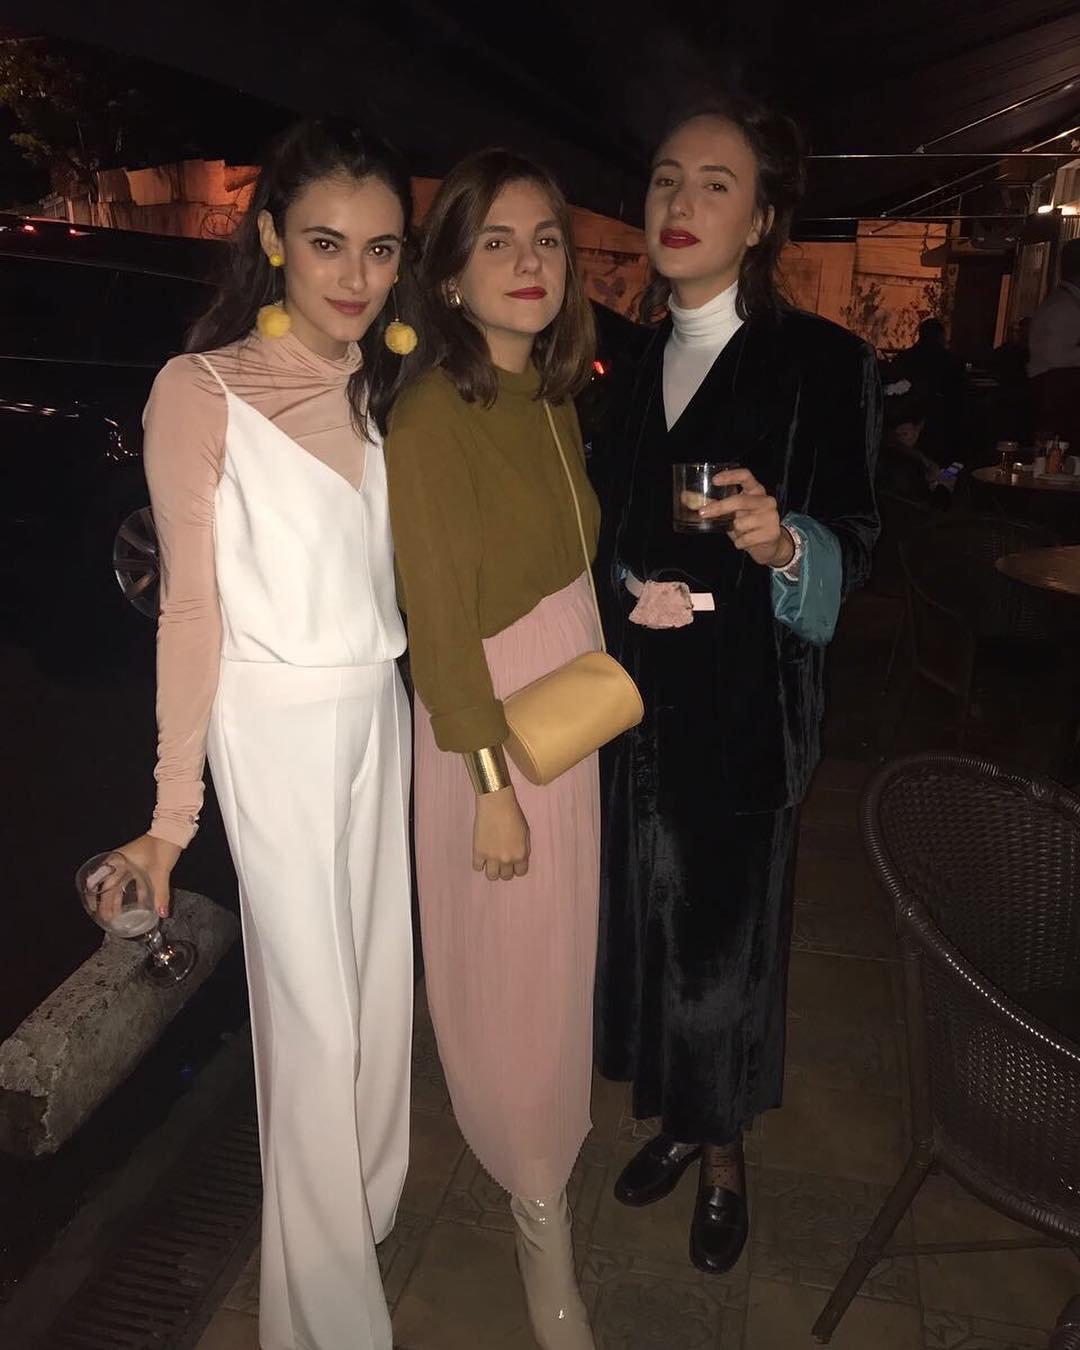 Mariana Adjuto  - macacao-turtleneck-vestido-blusa-manga-comprida-vestido-turtleneck - vestido - outono - Street Style